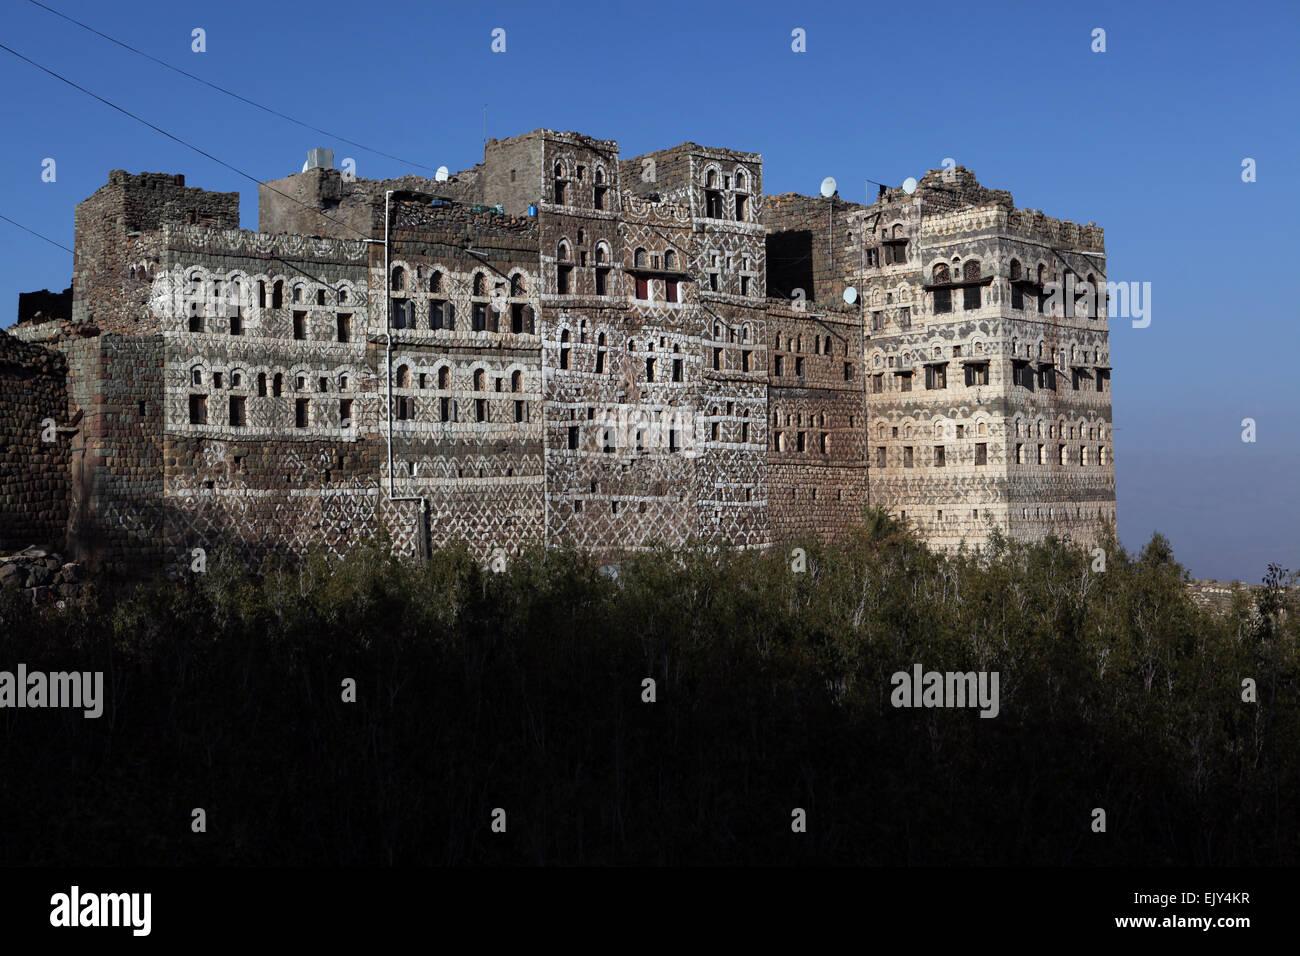 Architecture in Yemen. - Stock Image